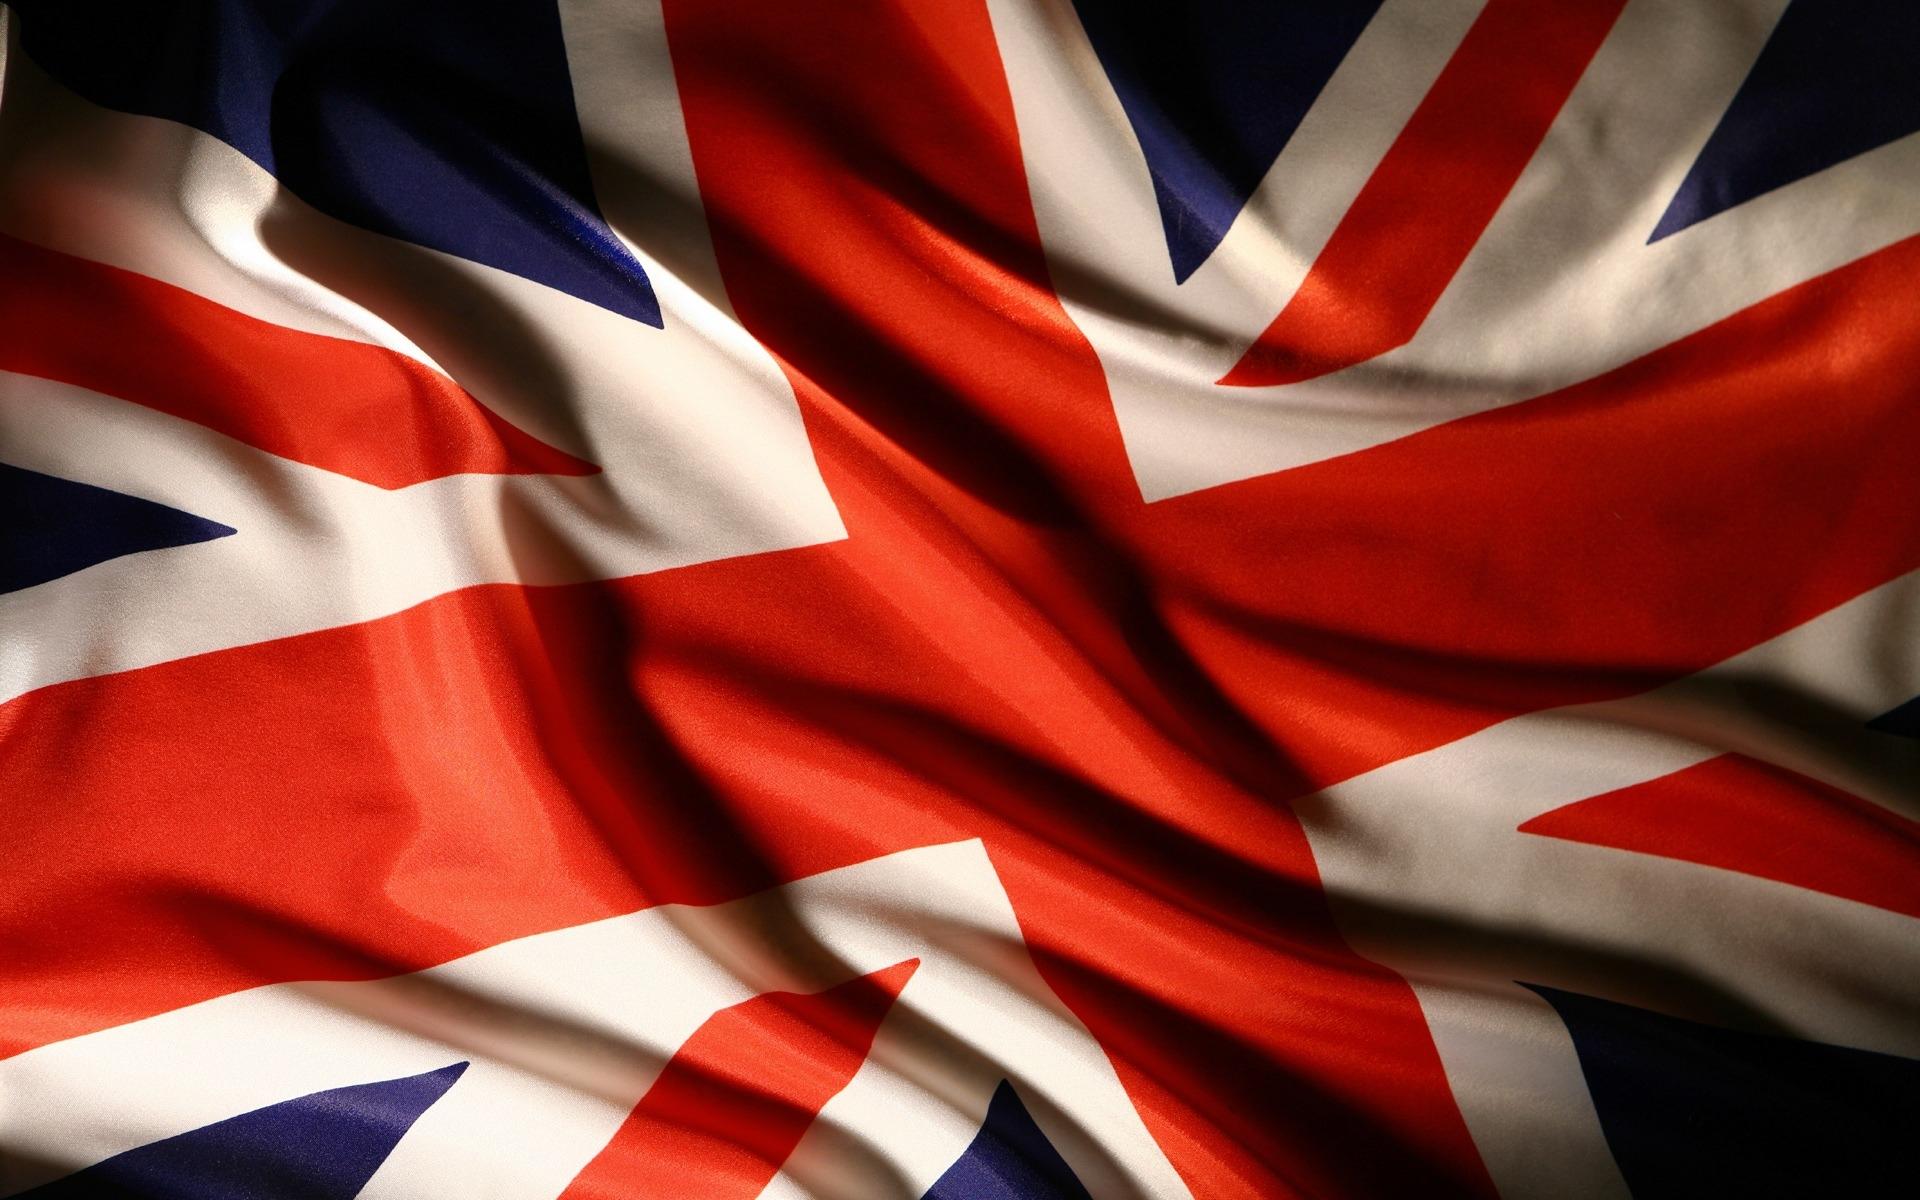 1920x1200 British Flag desktop PC and Mac wallpaper 1920x1200